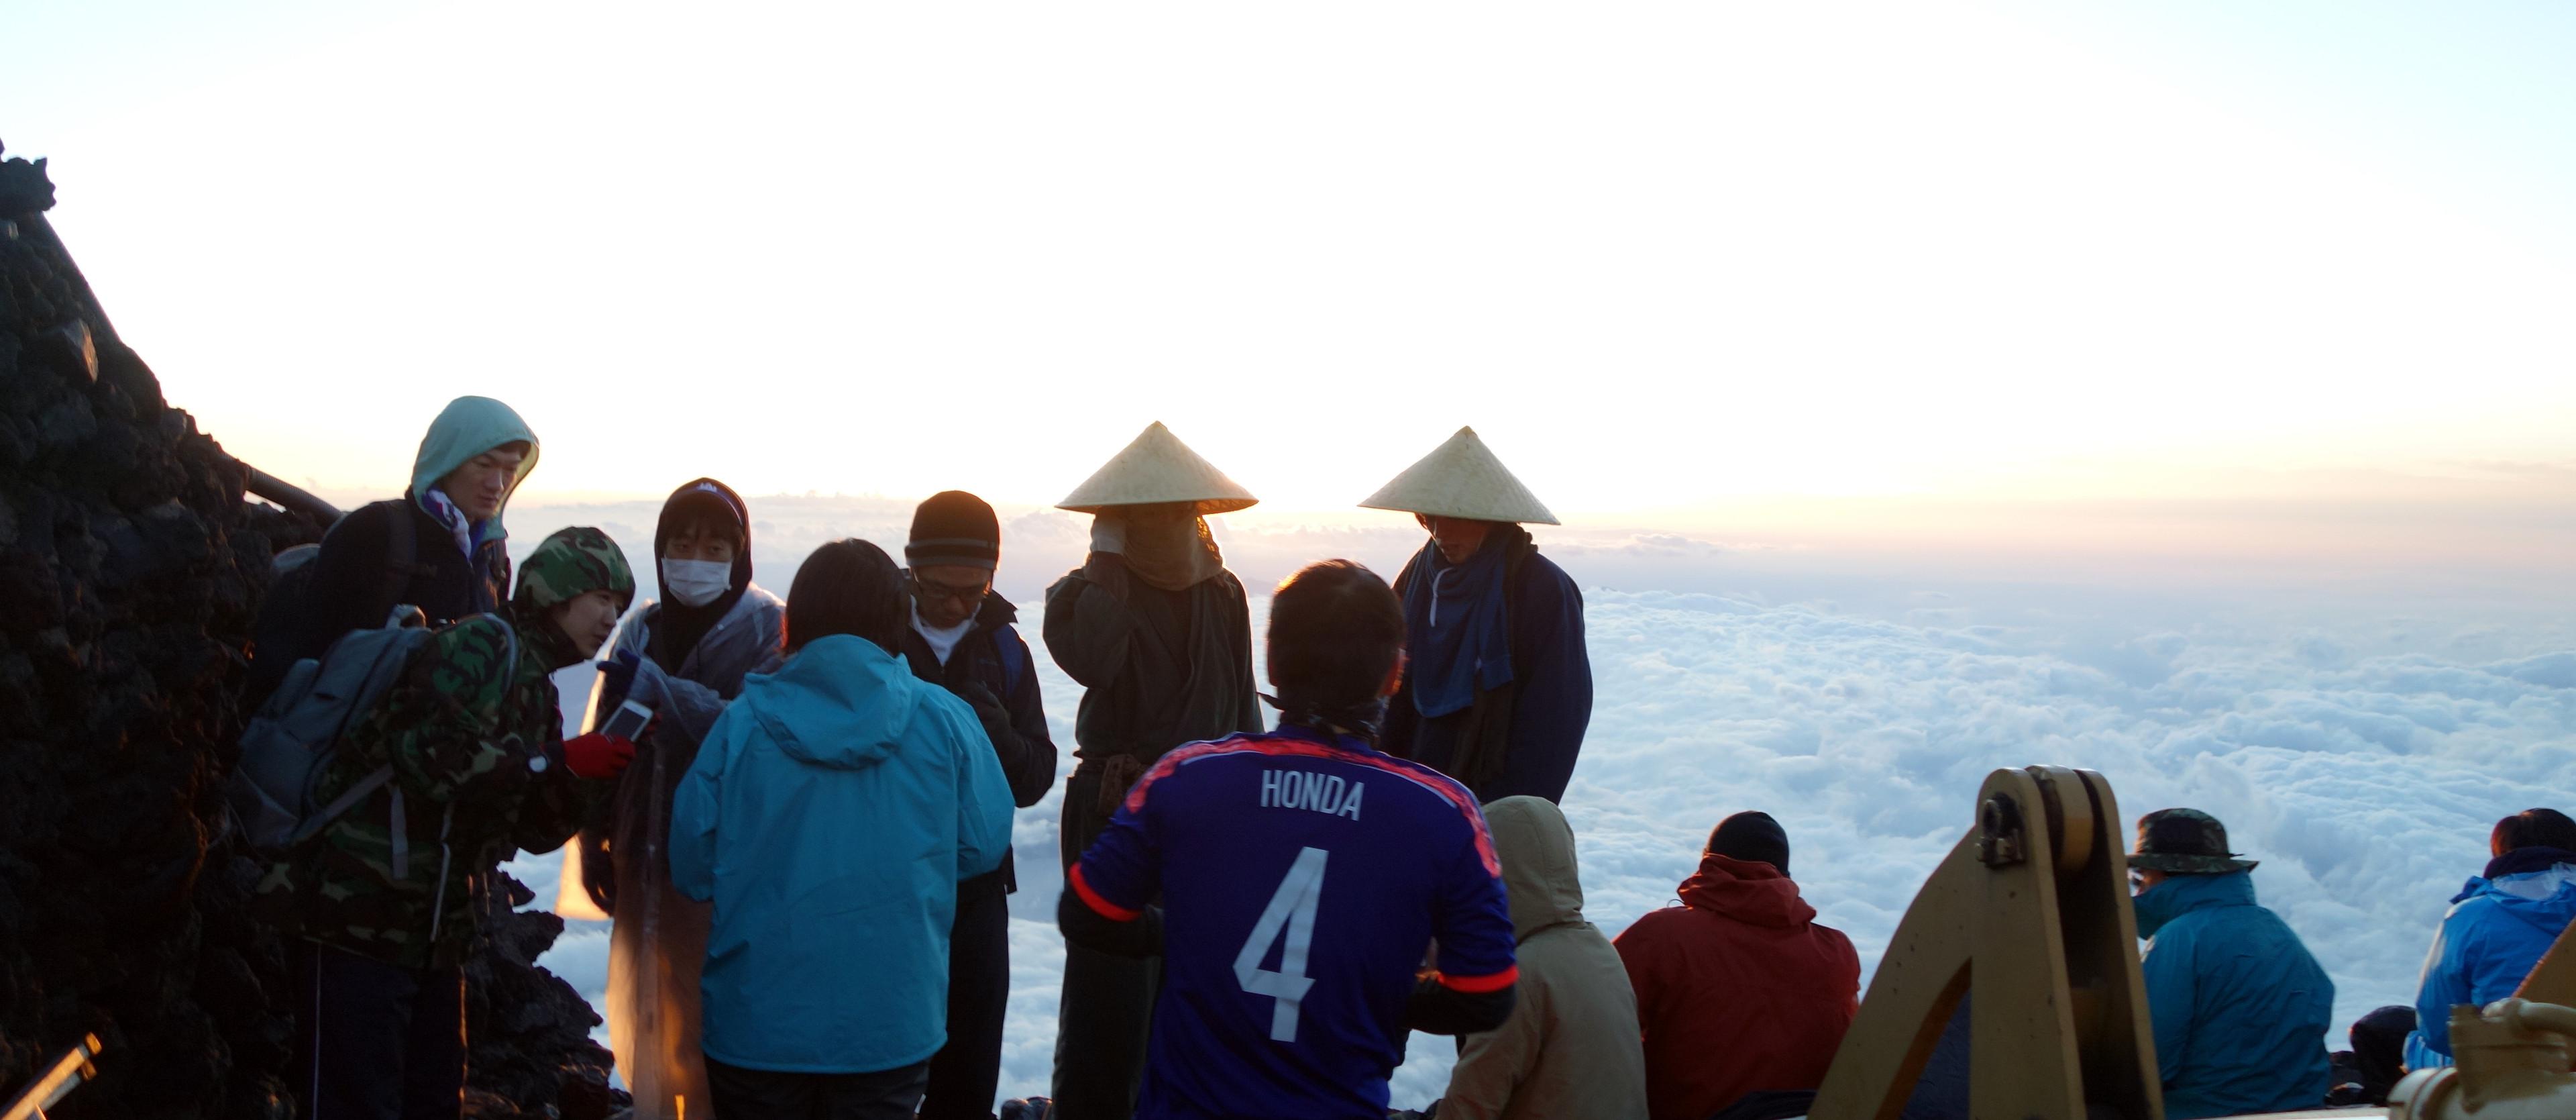 20140806 221251 fujisan pilgrims